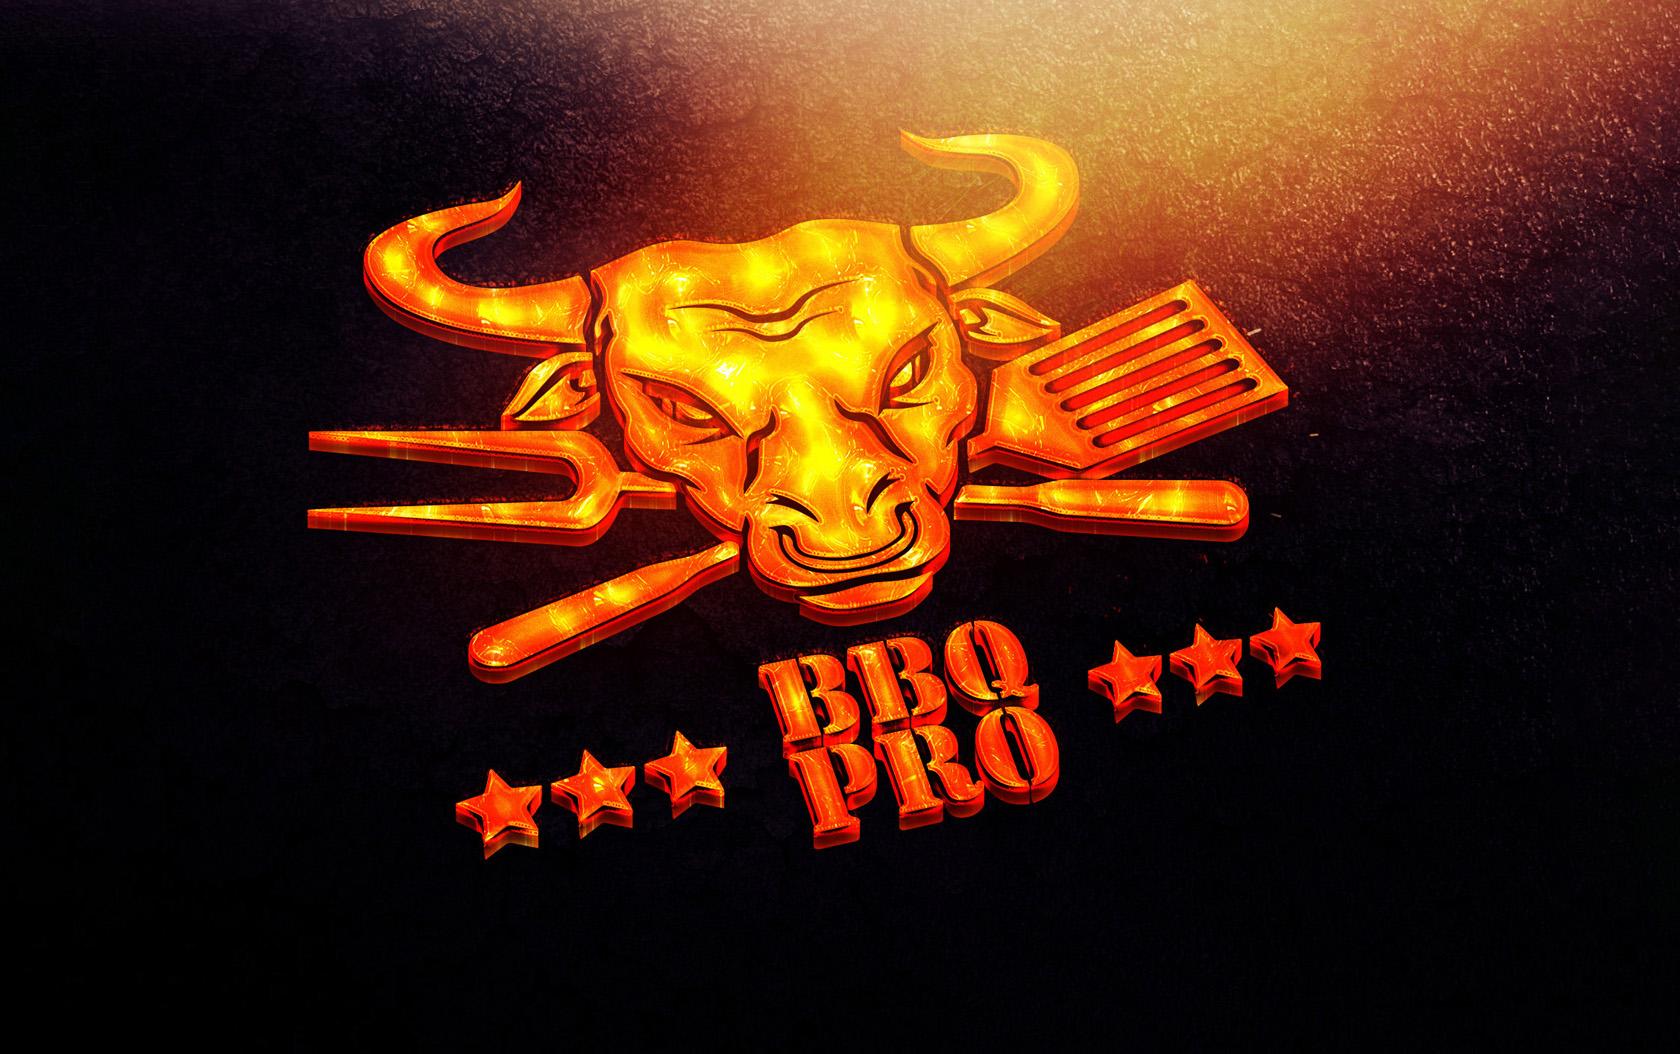 BBQ PRO создание логотипа